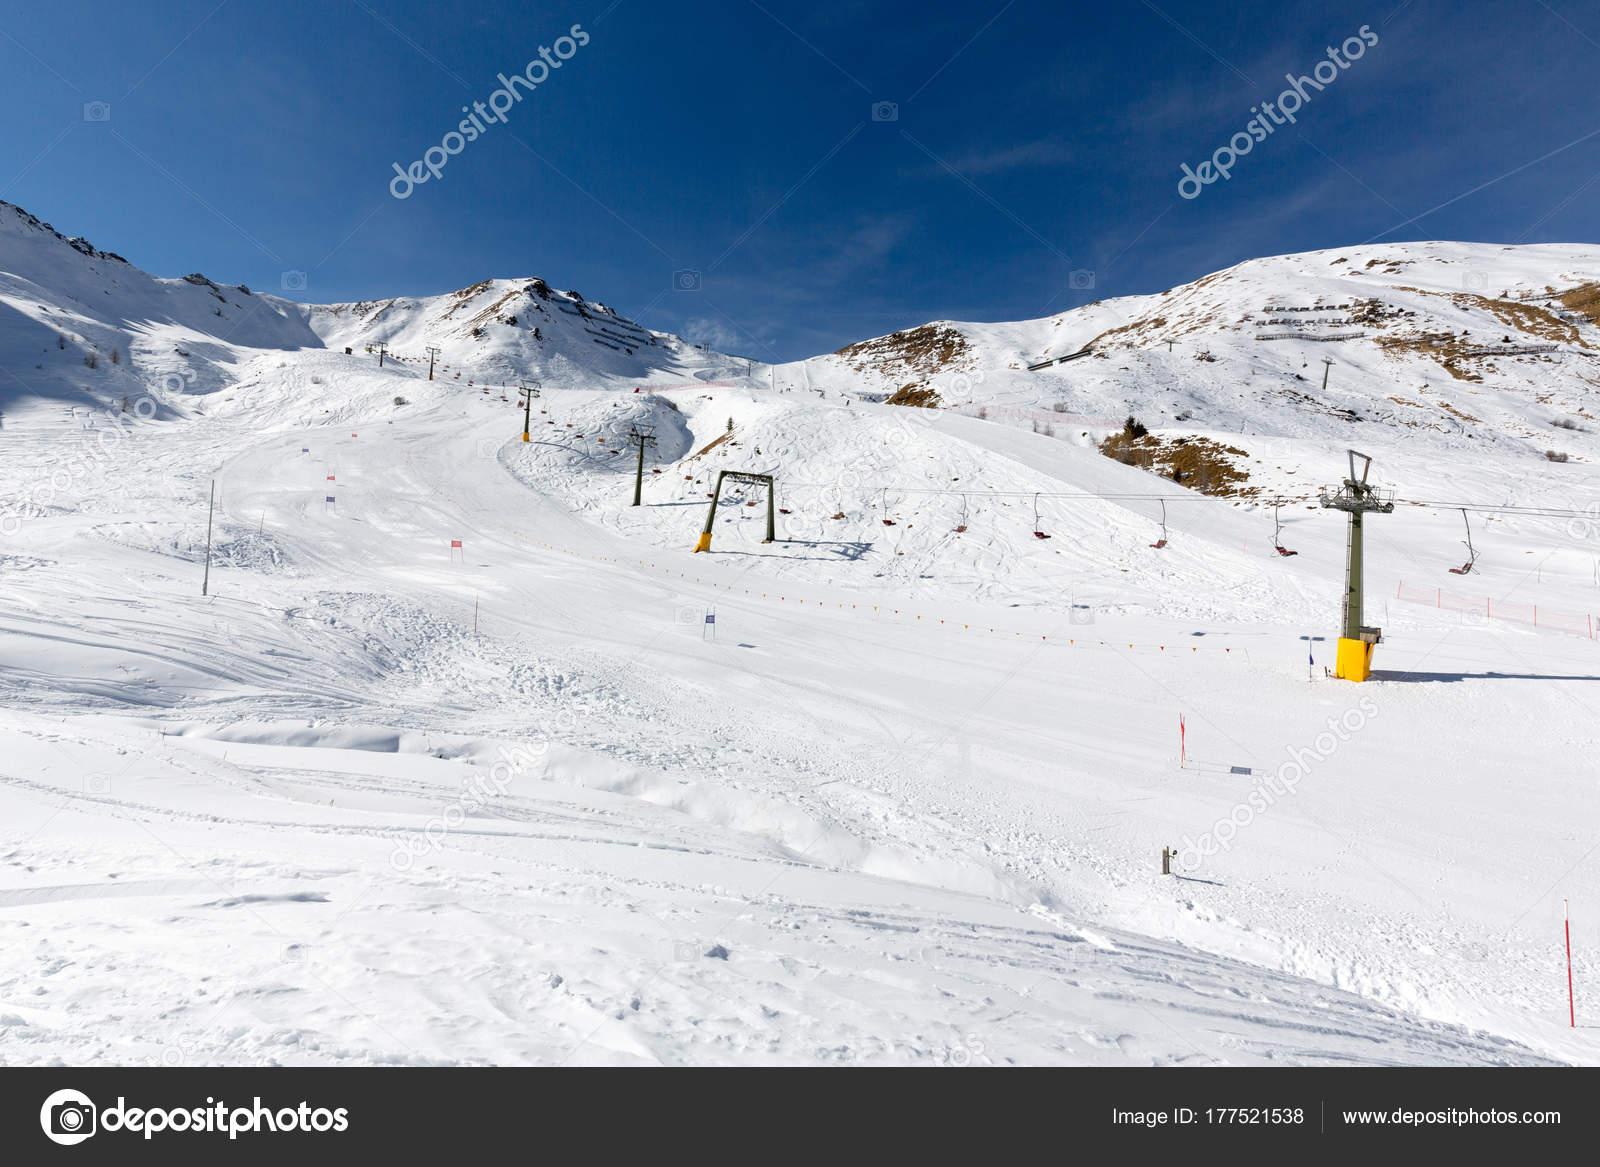 ciampac ski resort, val di fassa valley, dolomites, italy — stock